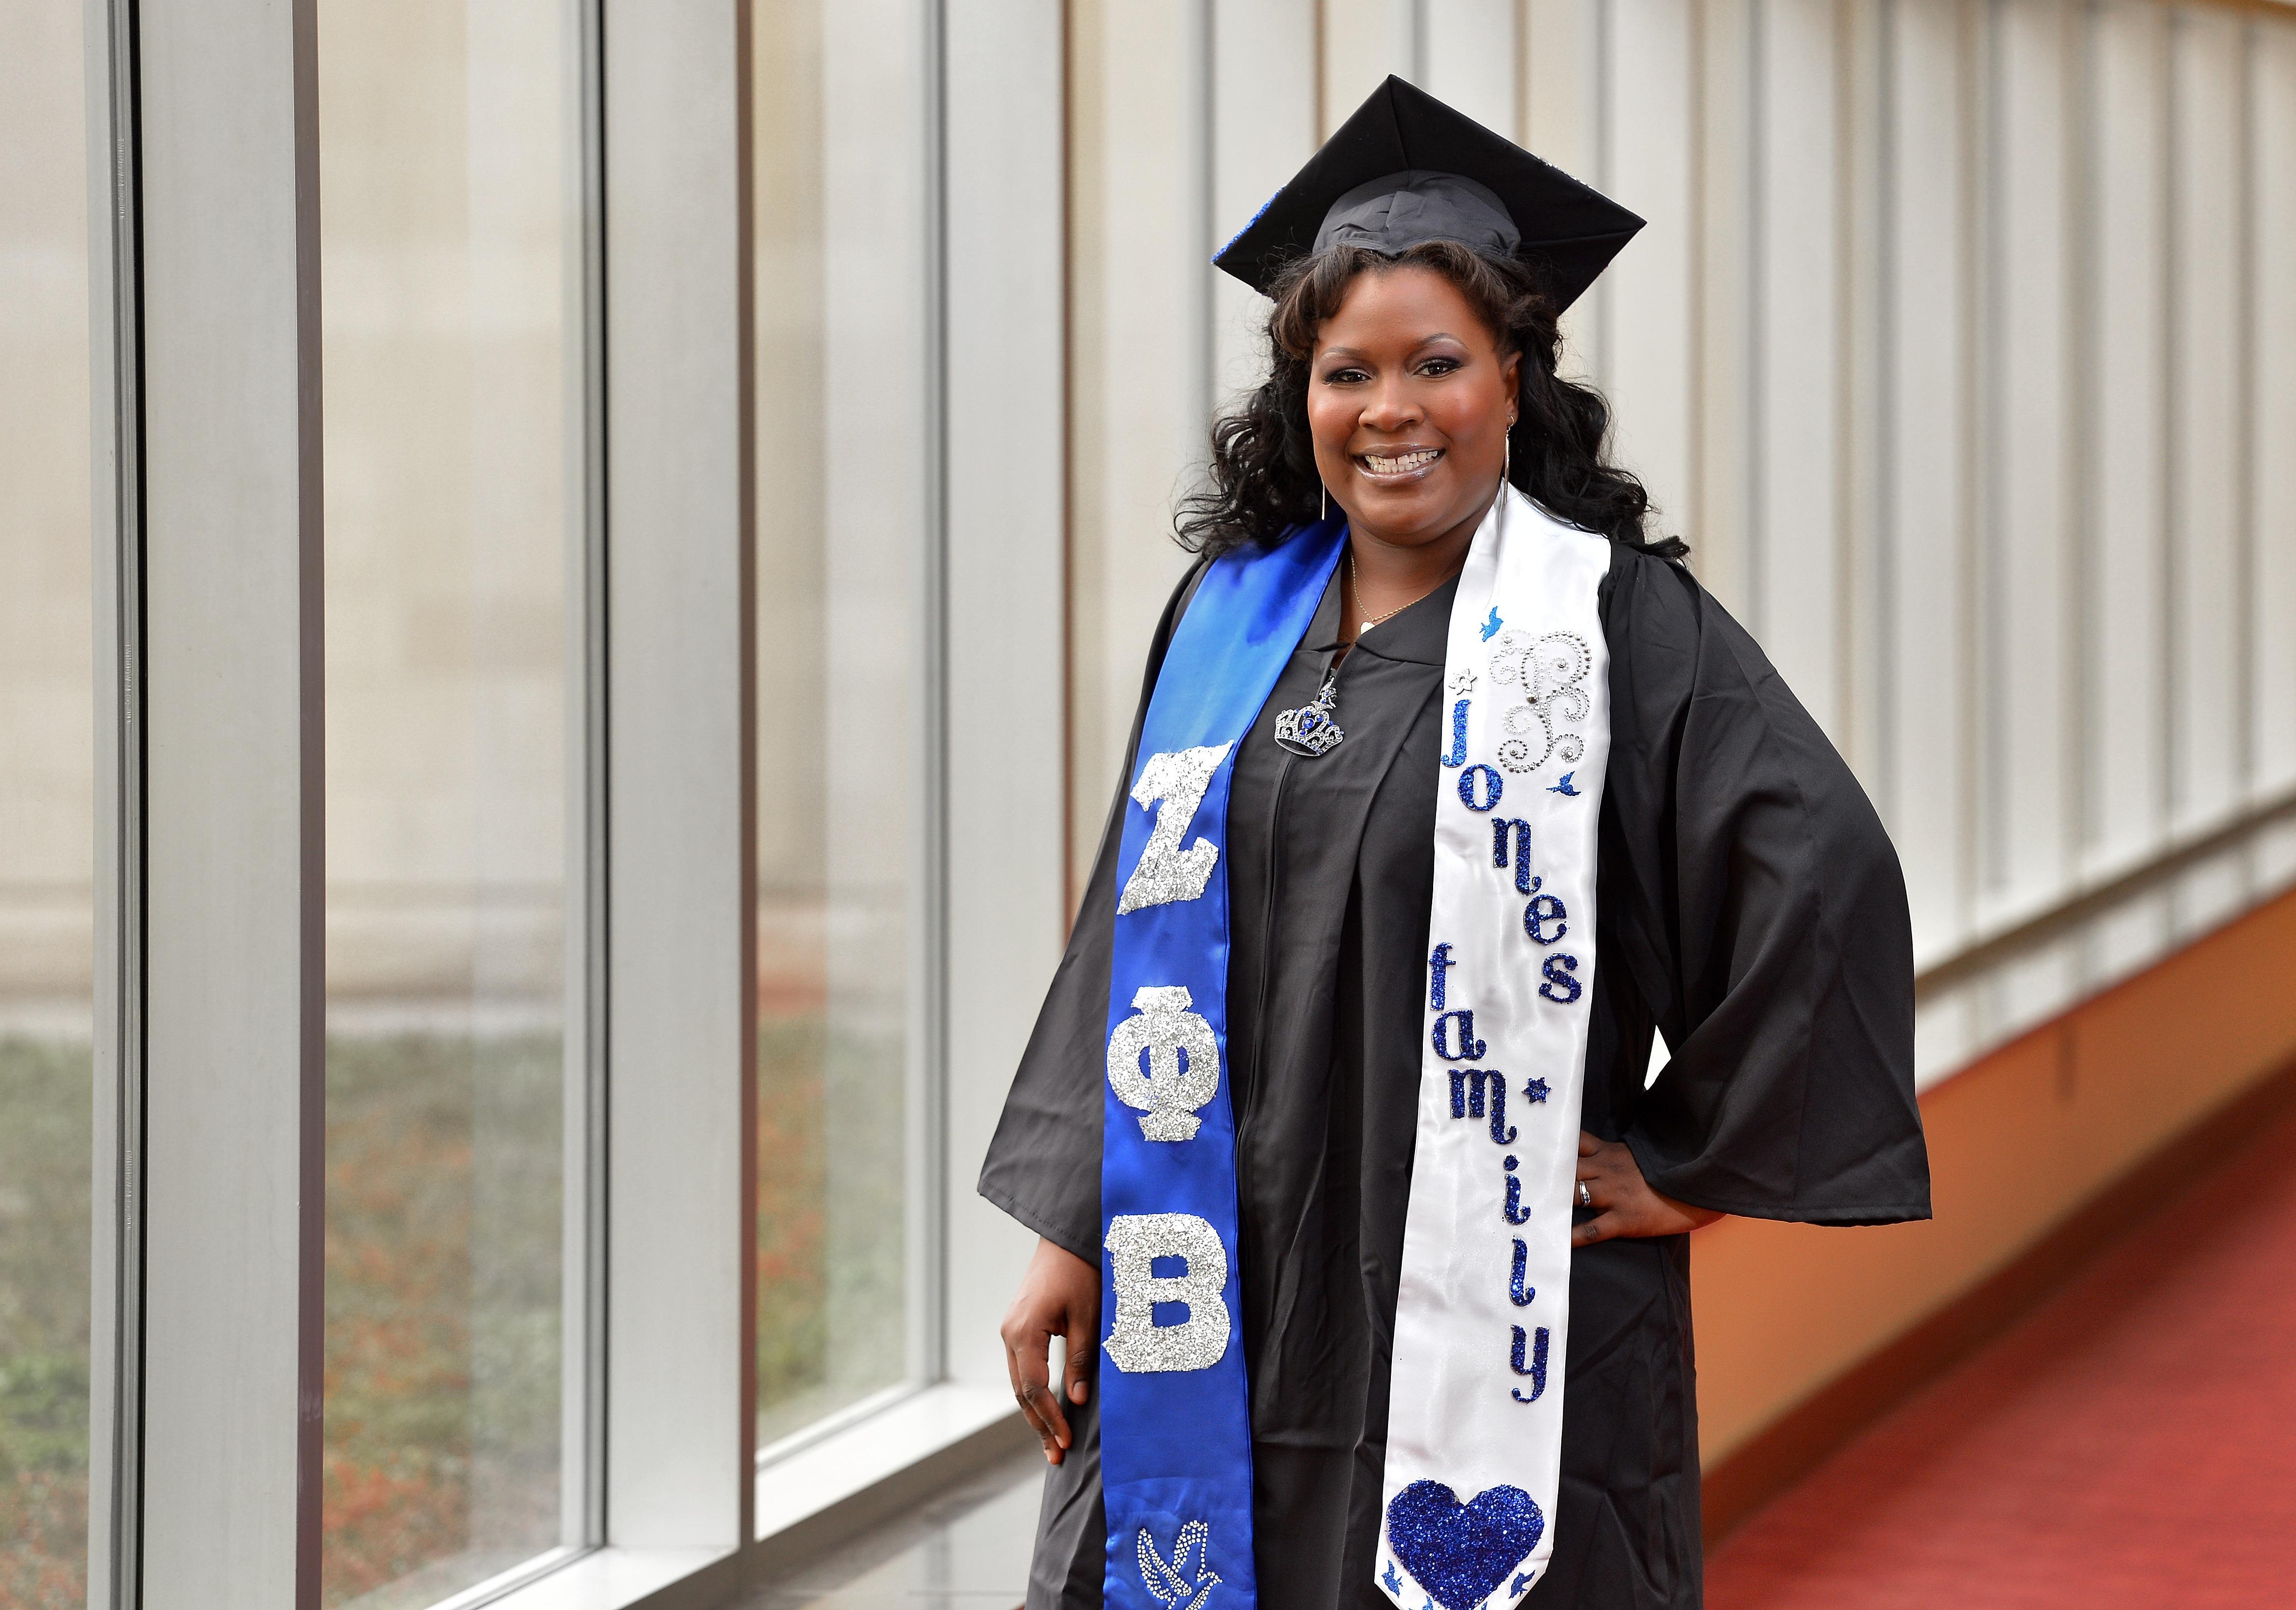 Iowa State graduating senior embarks on new journey to inspire ...